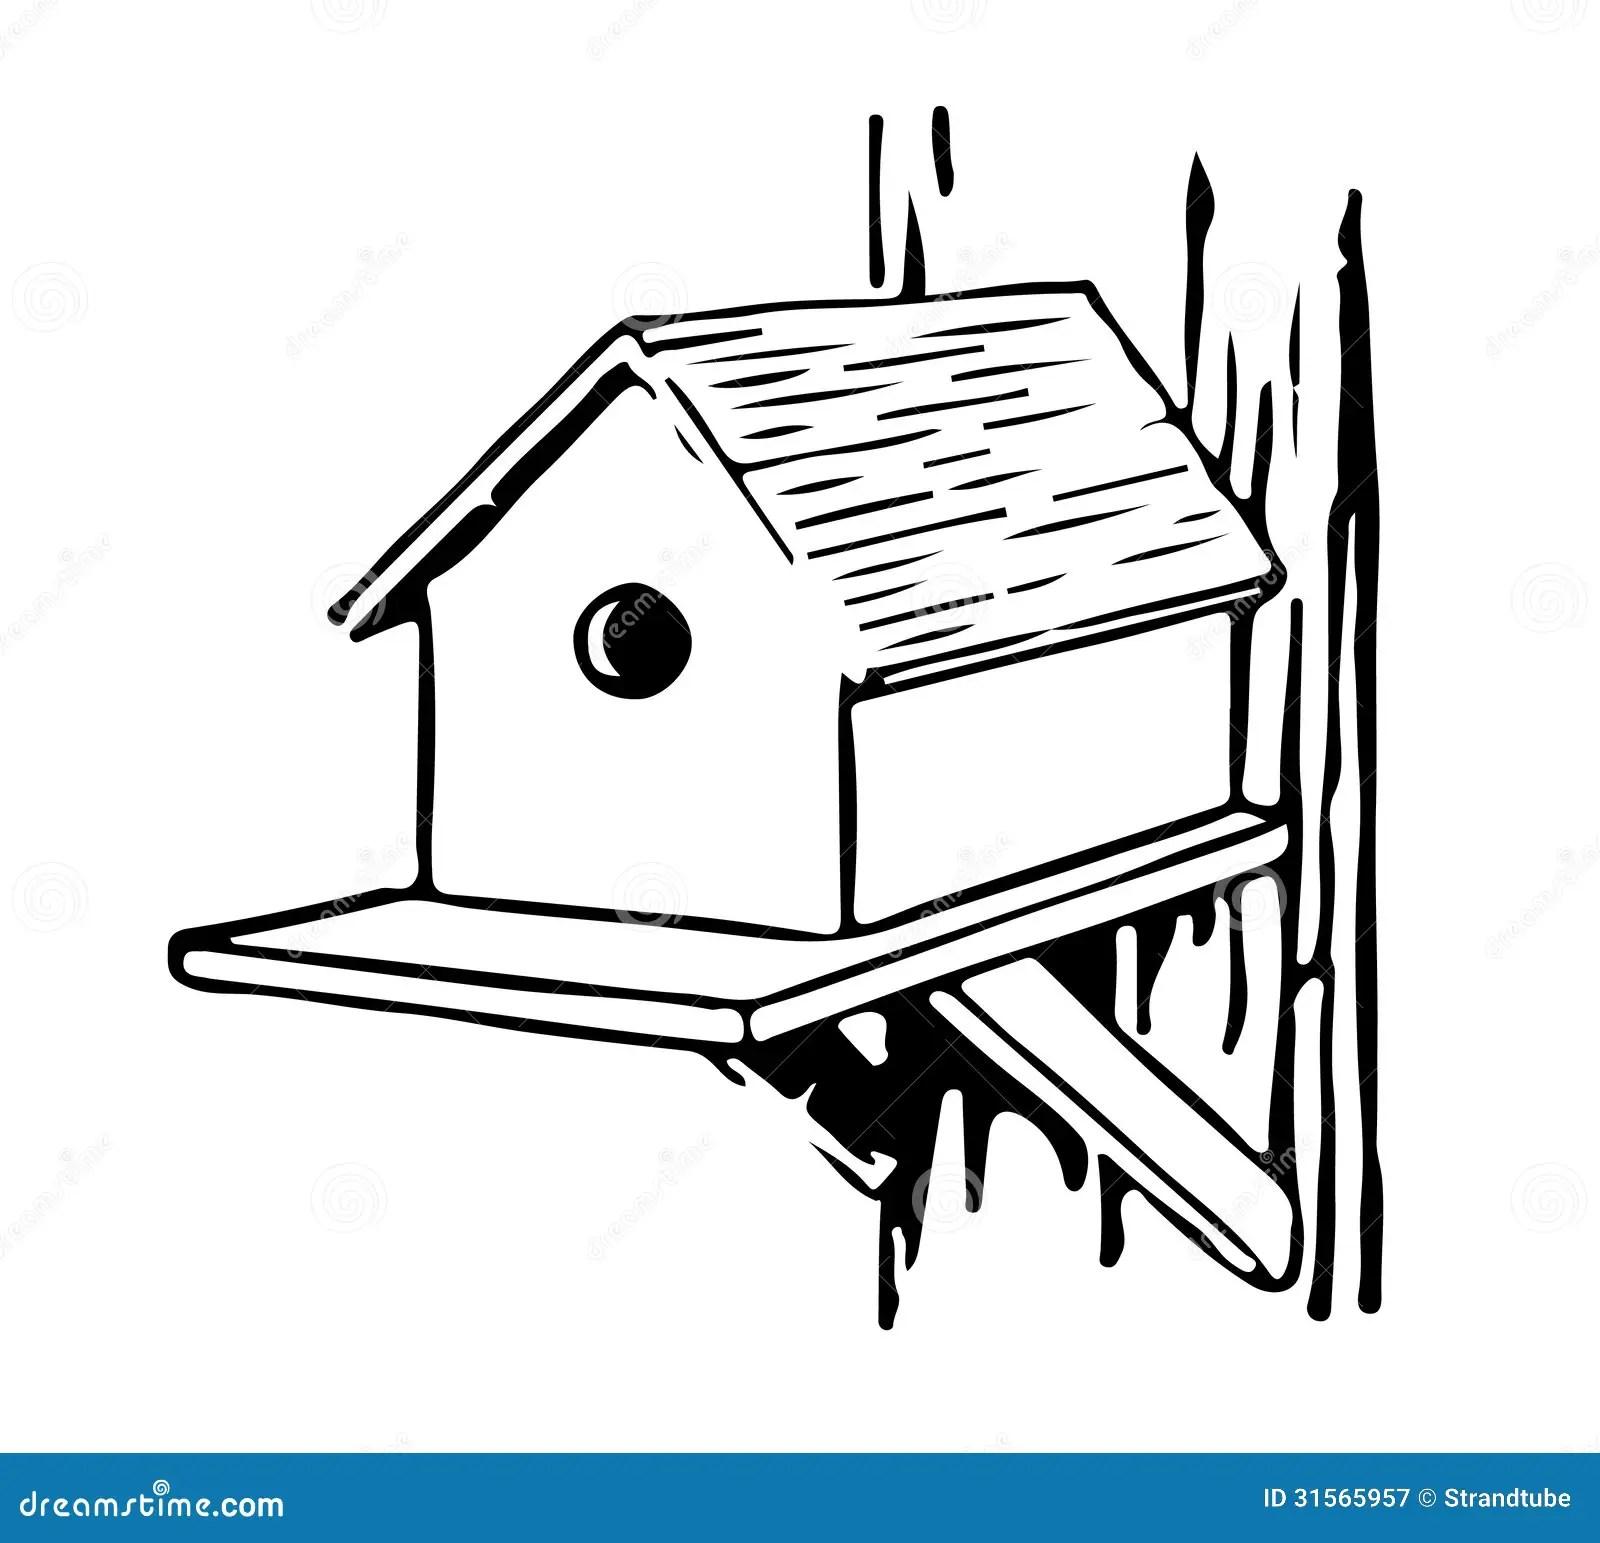 Bird Feeder stock illustration. Illustration of graphic